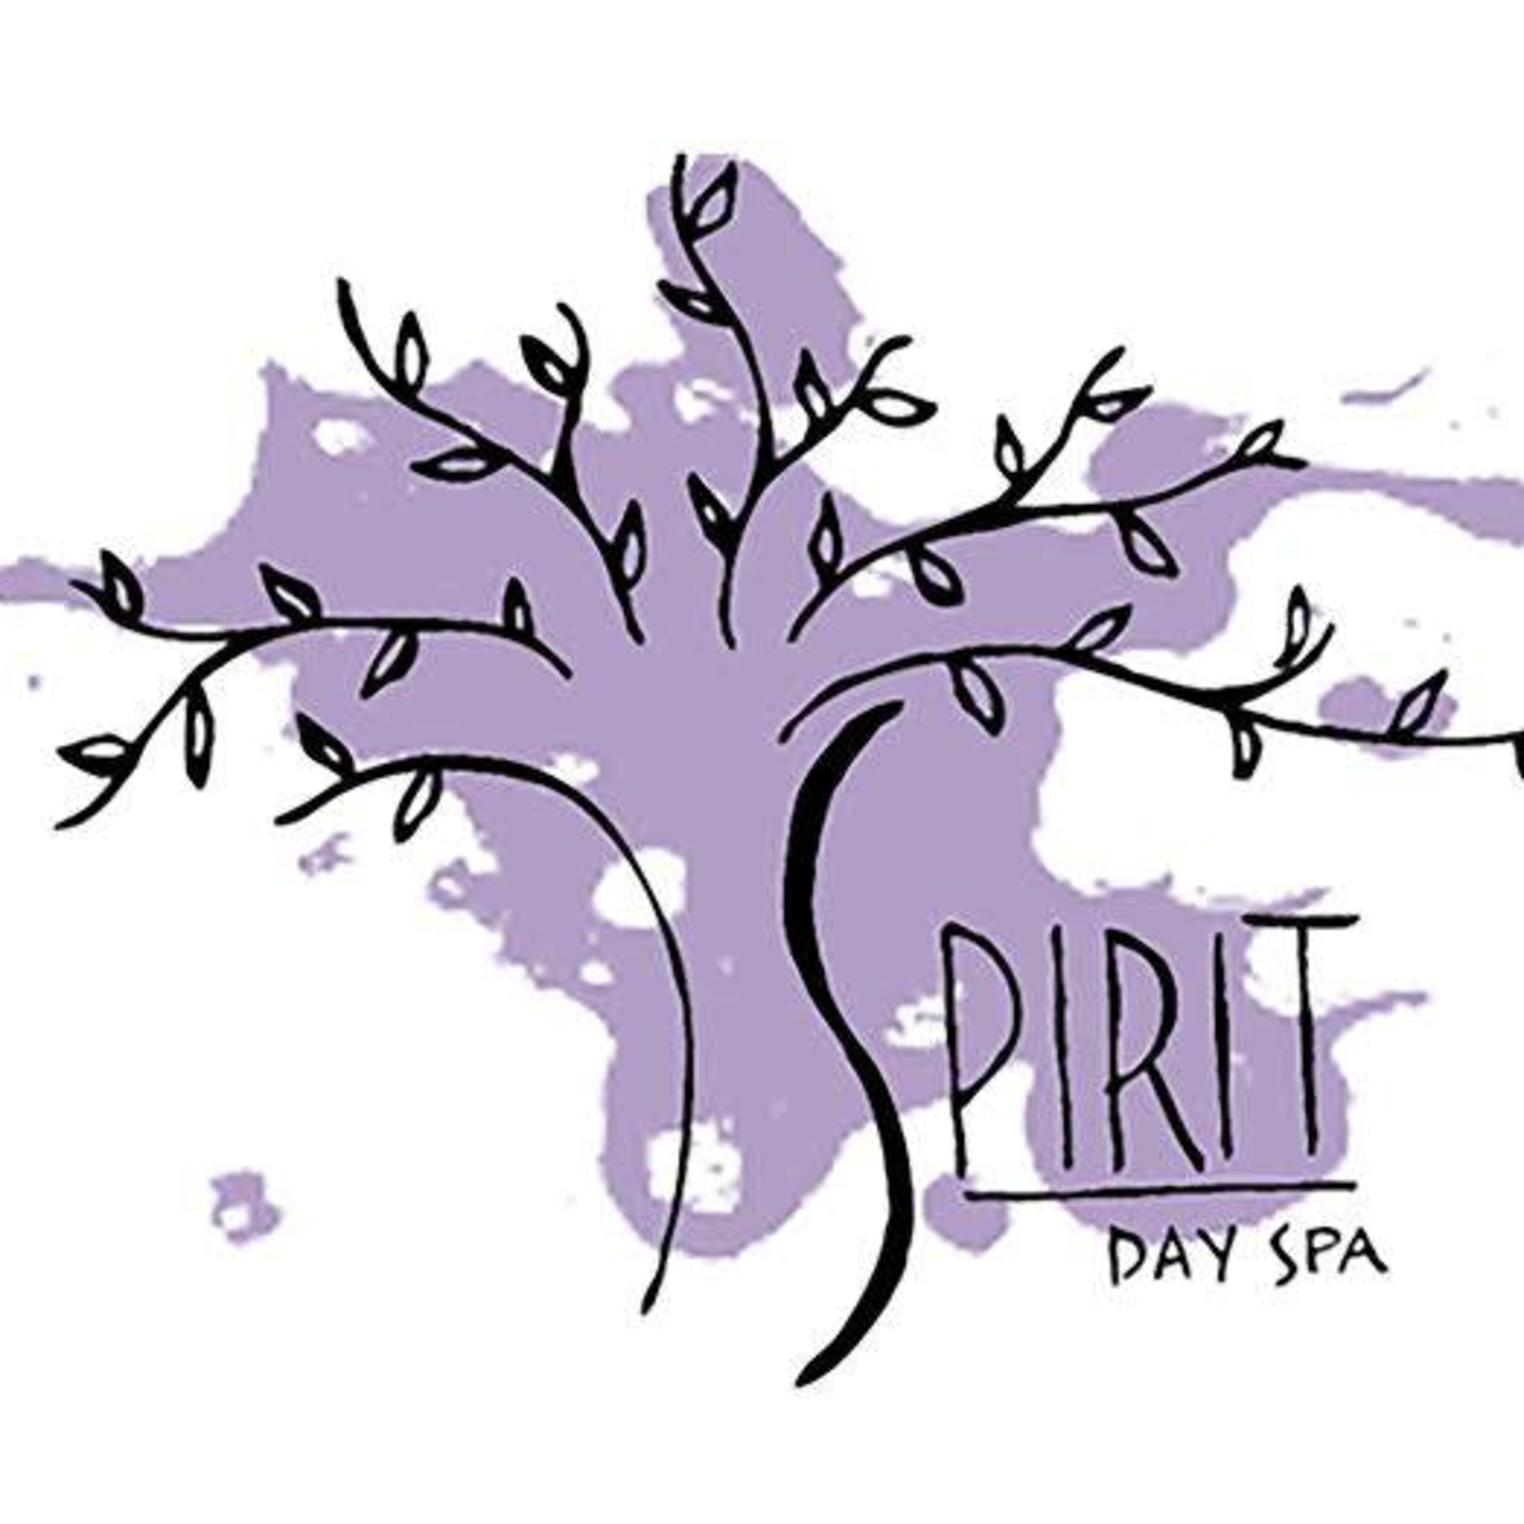 Spirit Day Spa